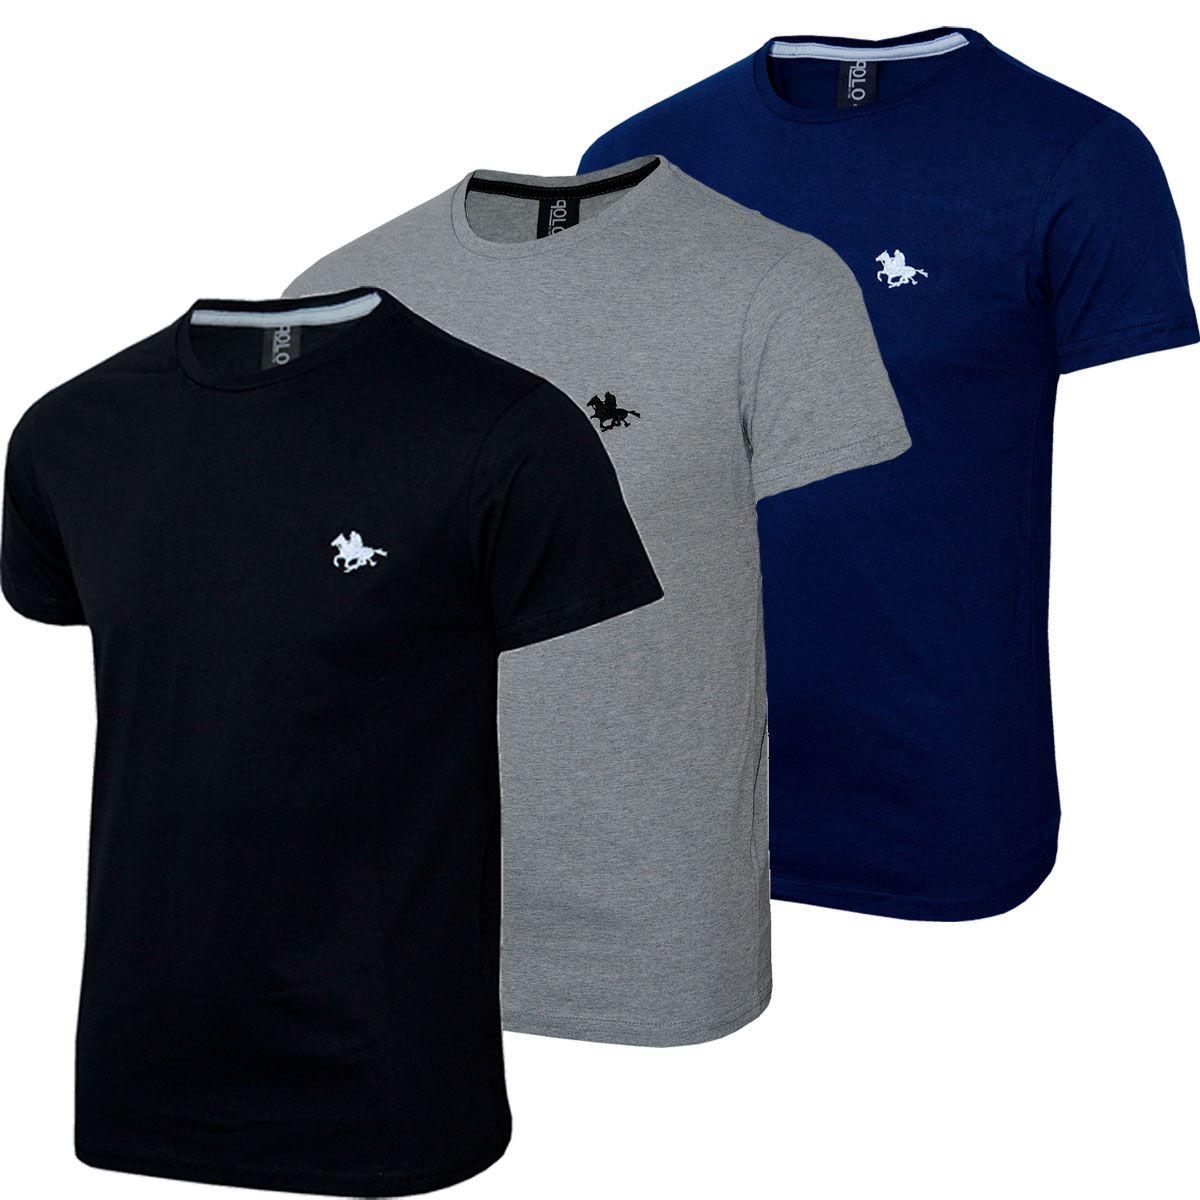 Kit C/3 Un Camisas Blusas Masculinas